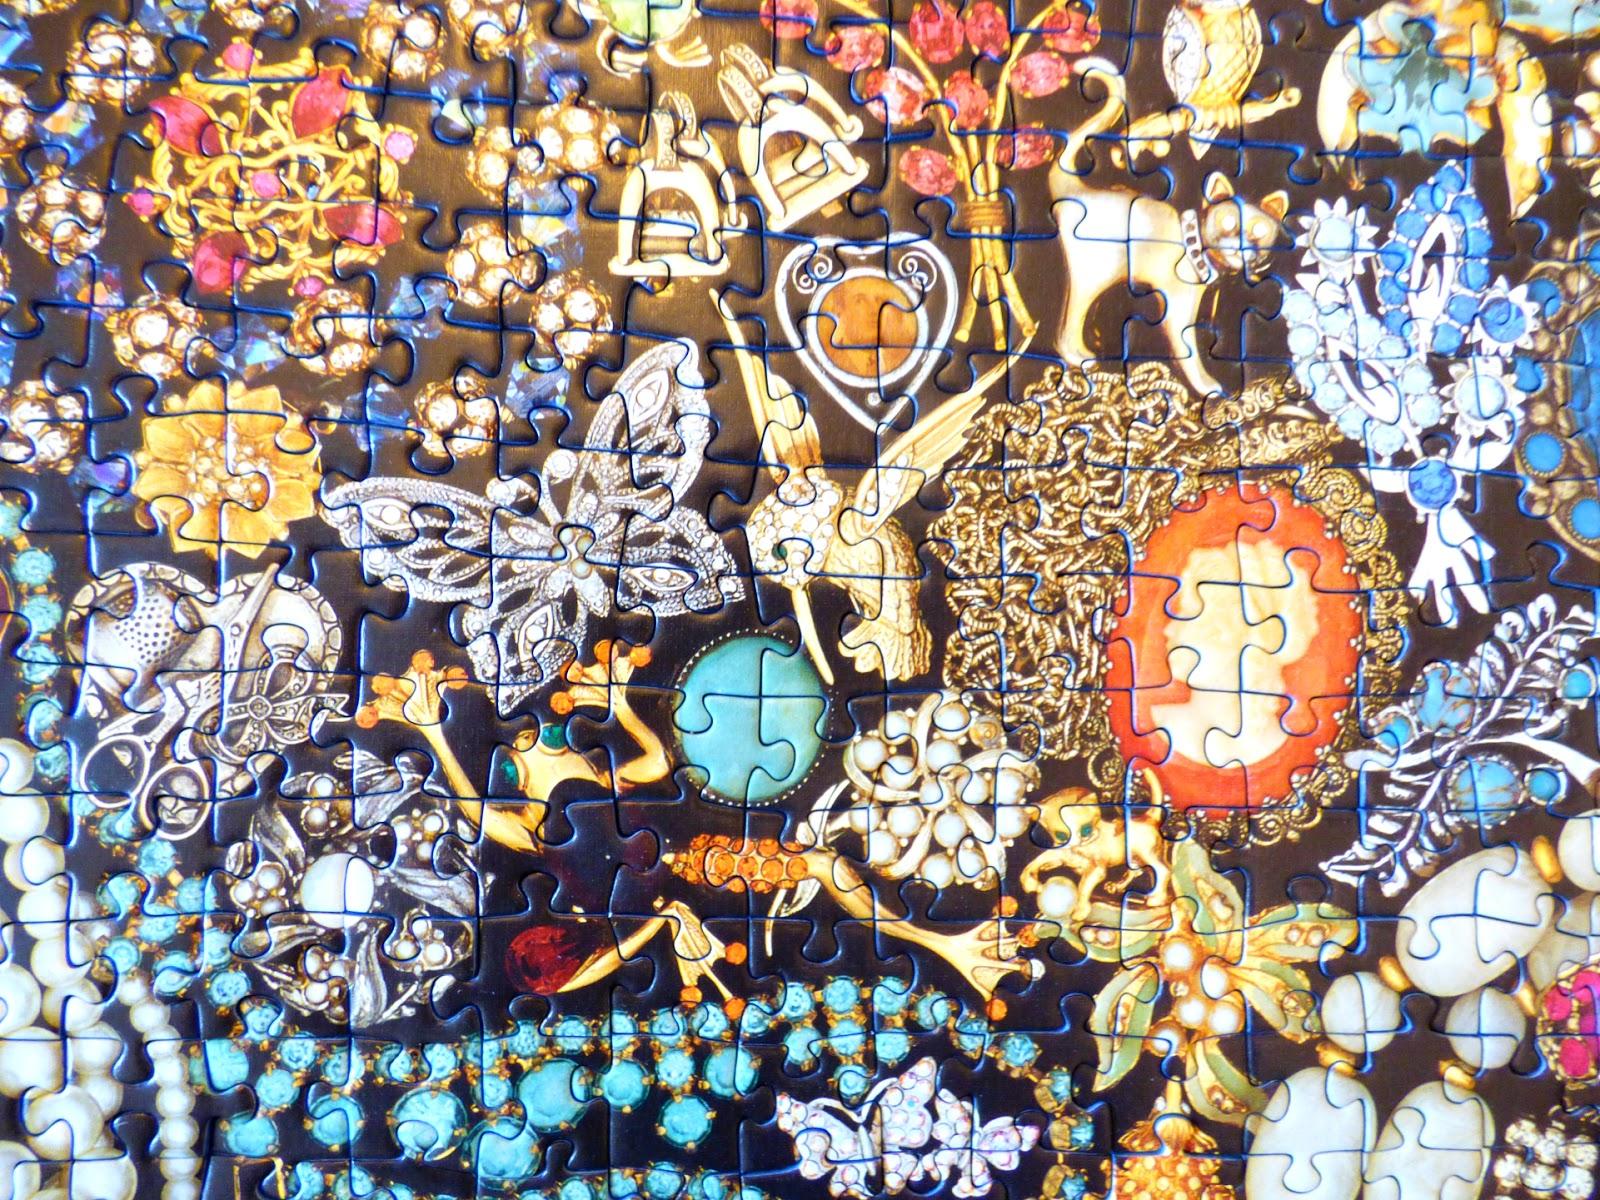 Jigsaw puzzles fetish pics 17